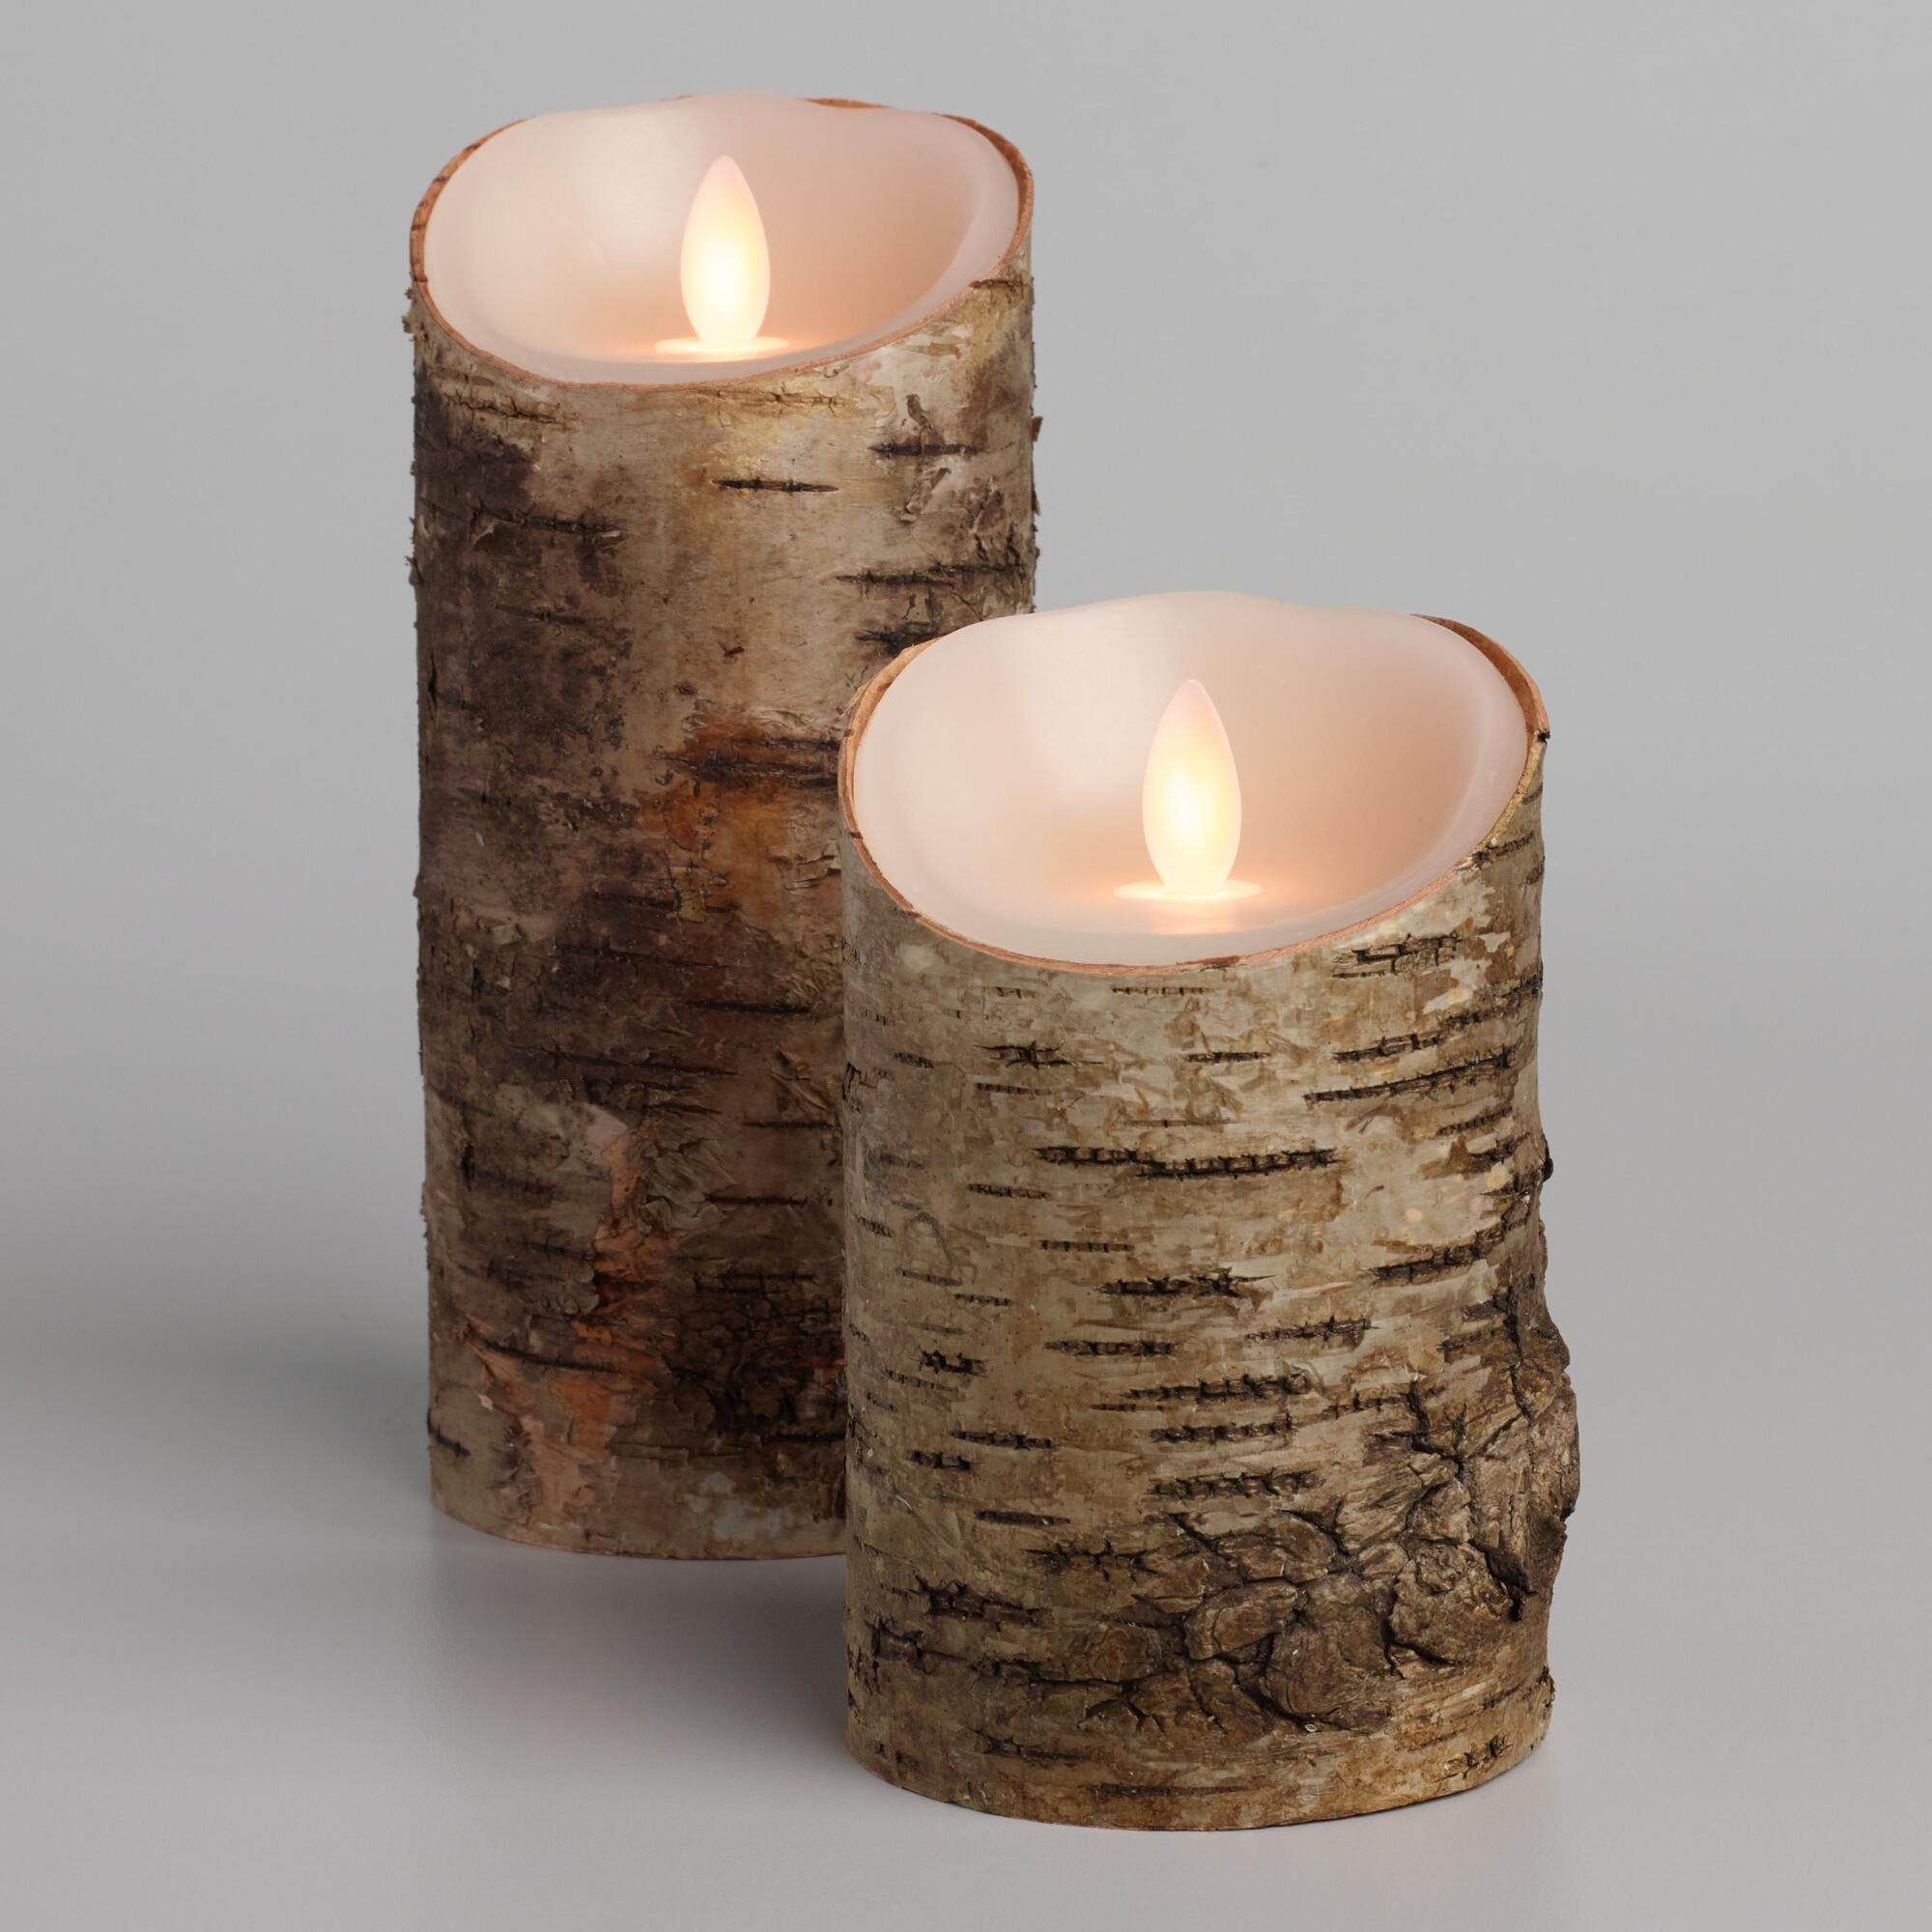 Birch Bark Iflicker Flameless Led Pillar Candle 3 X5 By World